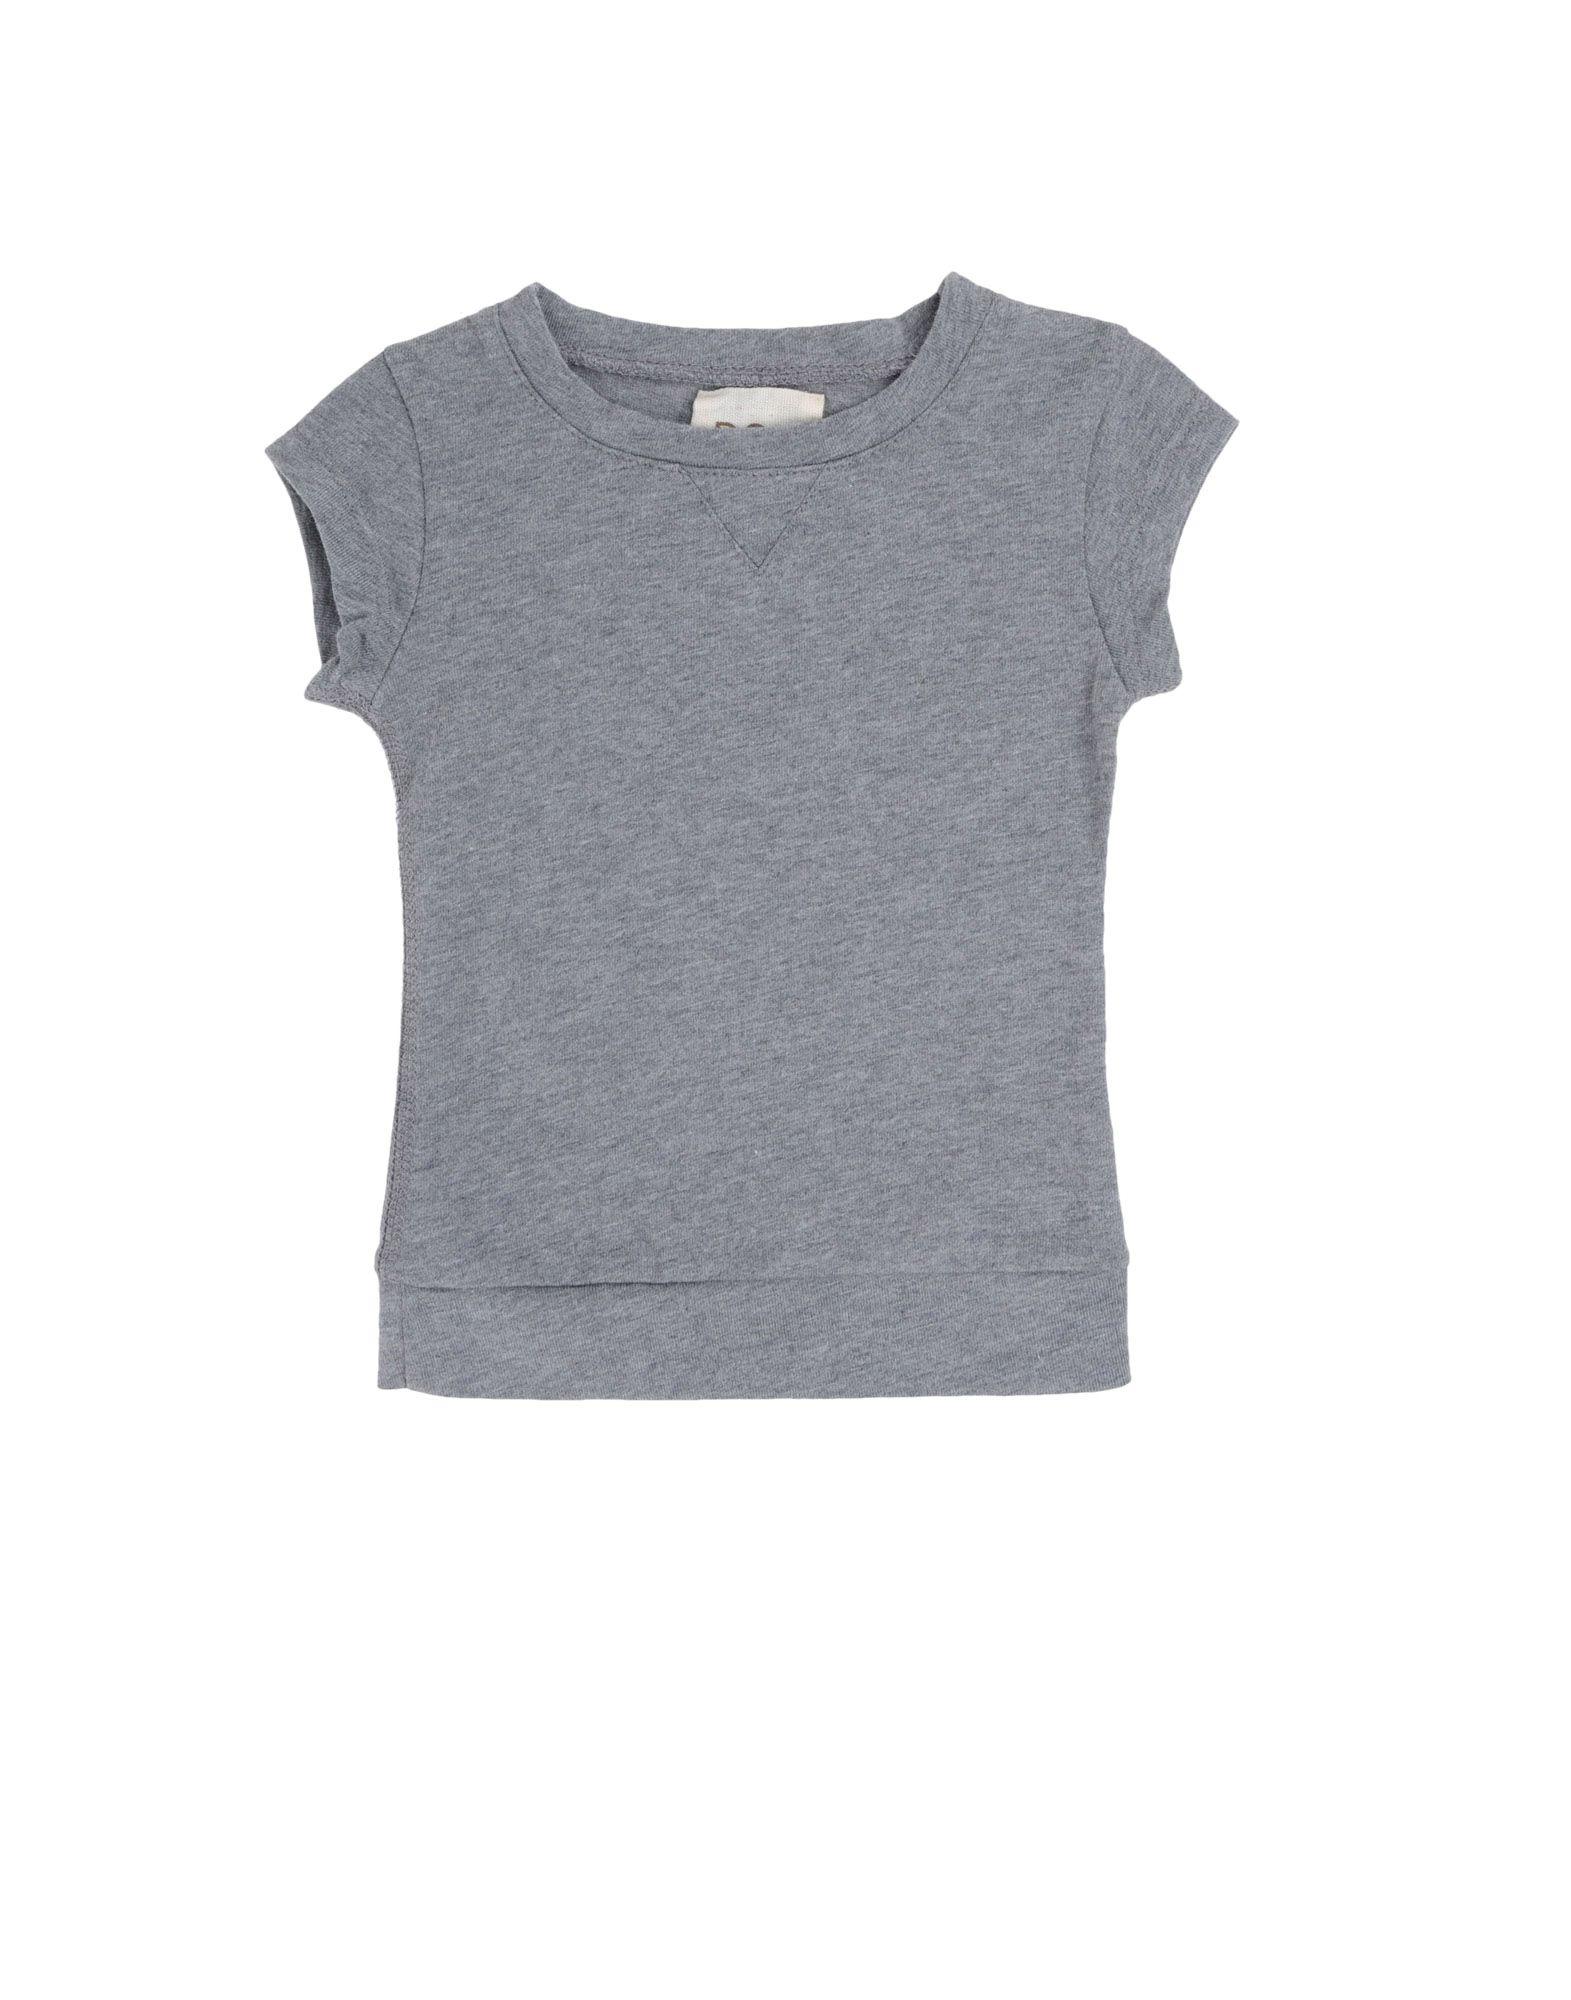 DOUUOD Mädchen 0-24 monate Kurzärmliges T-Shirt Farbe Grau Größe 4